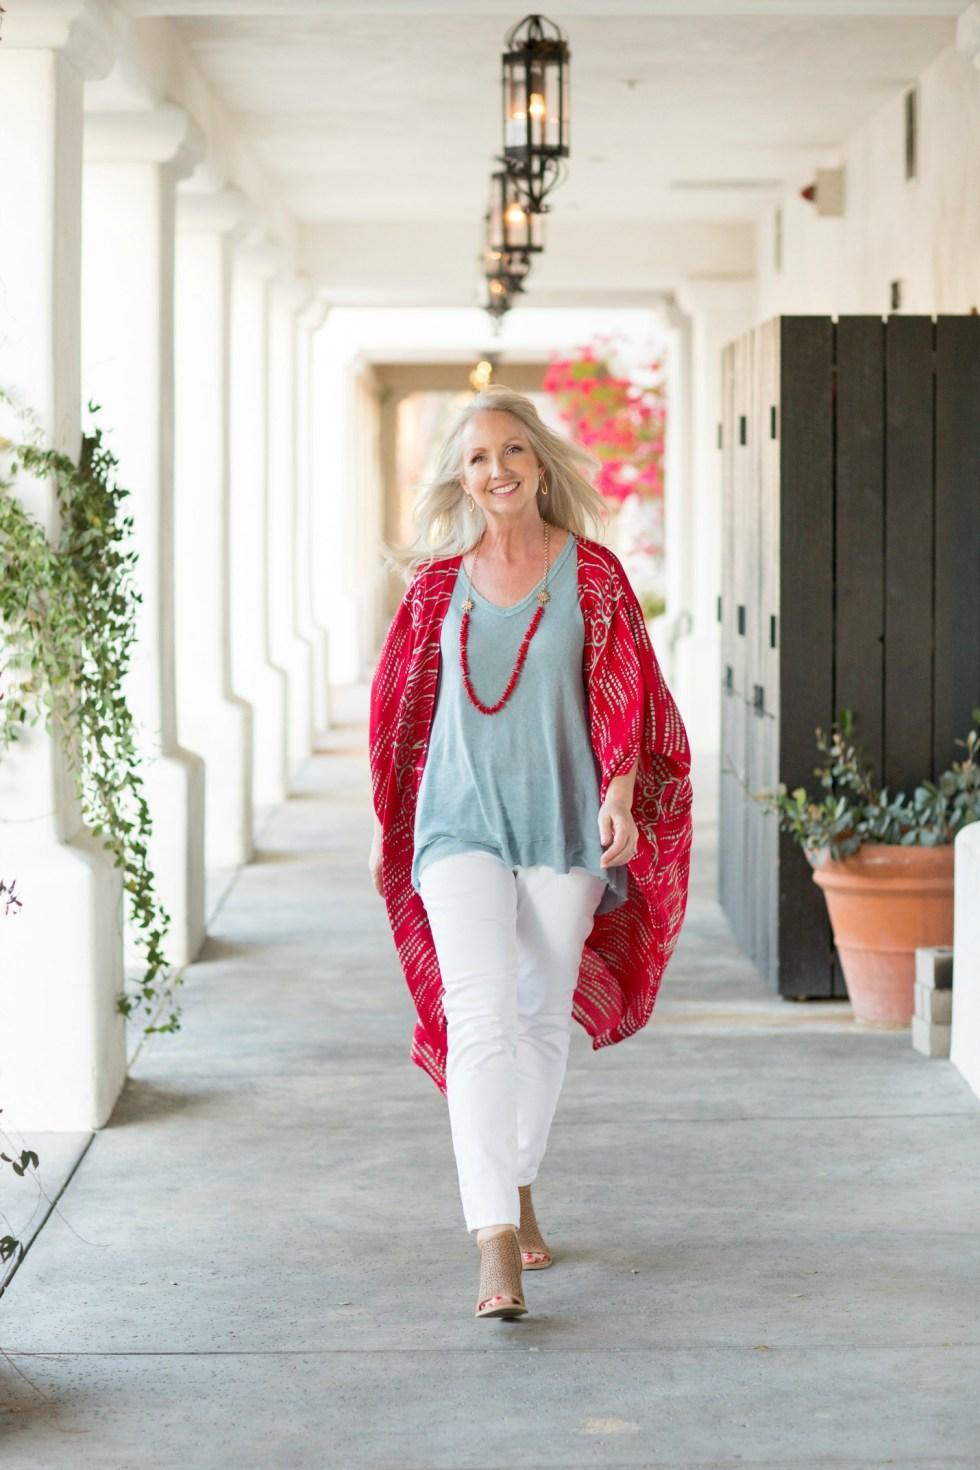 Kimono Red Aqua Top White Jeans 8